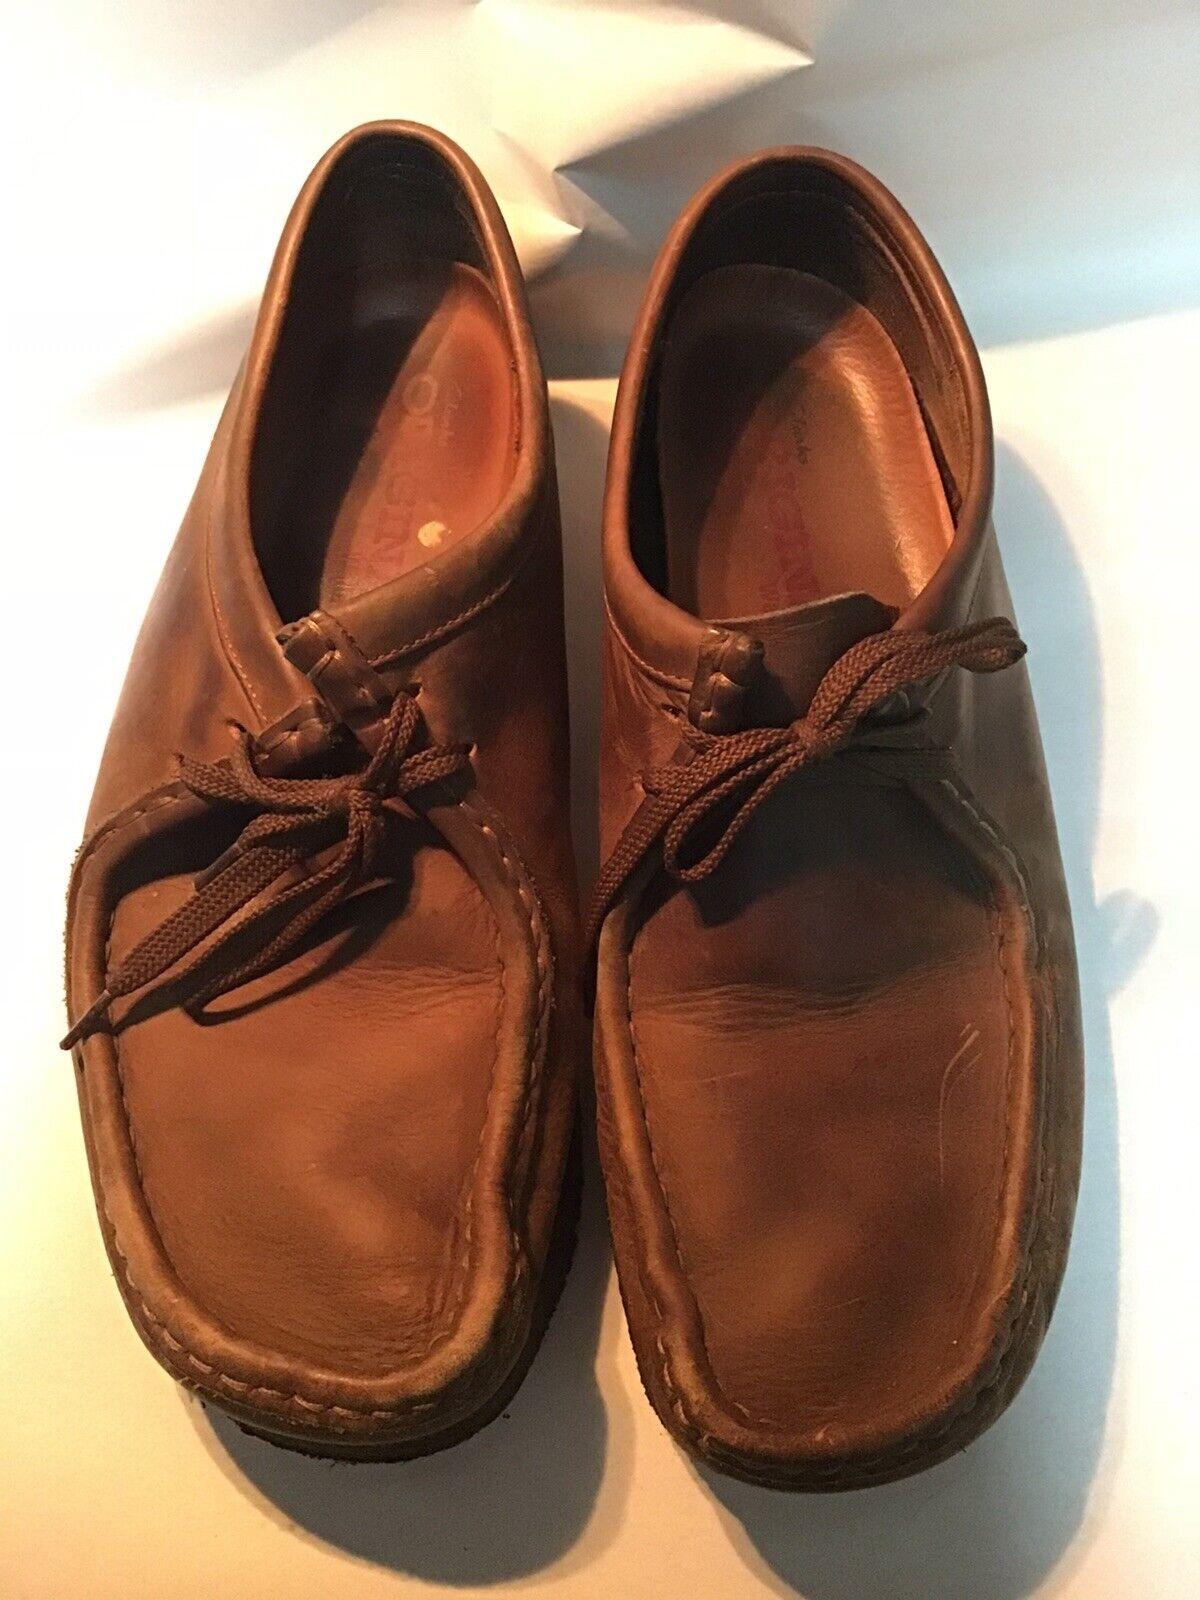 Clarks Originals Wallabee Hommes's  marron cuir chaussures Taille 10 1 2 M